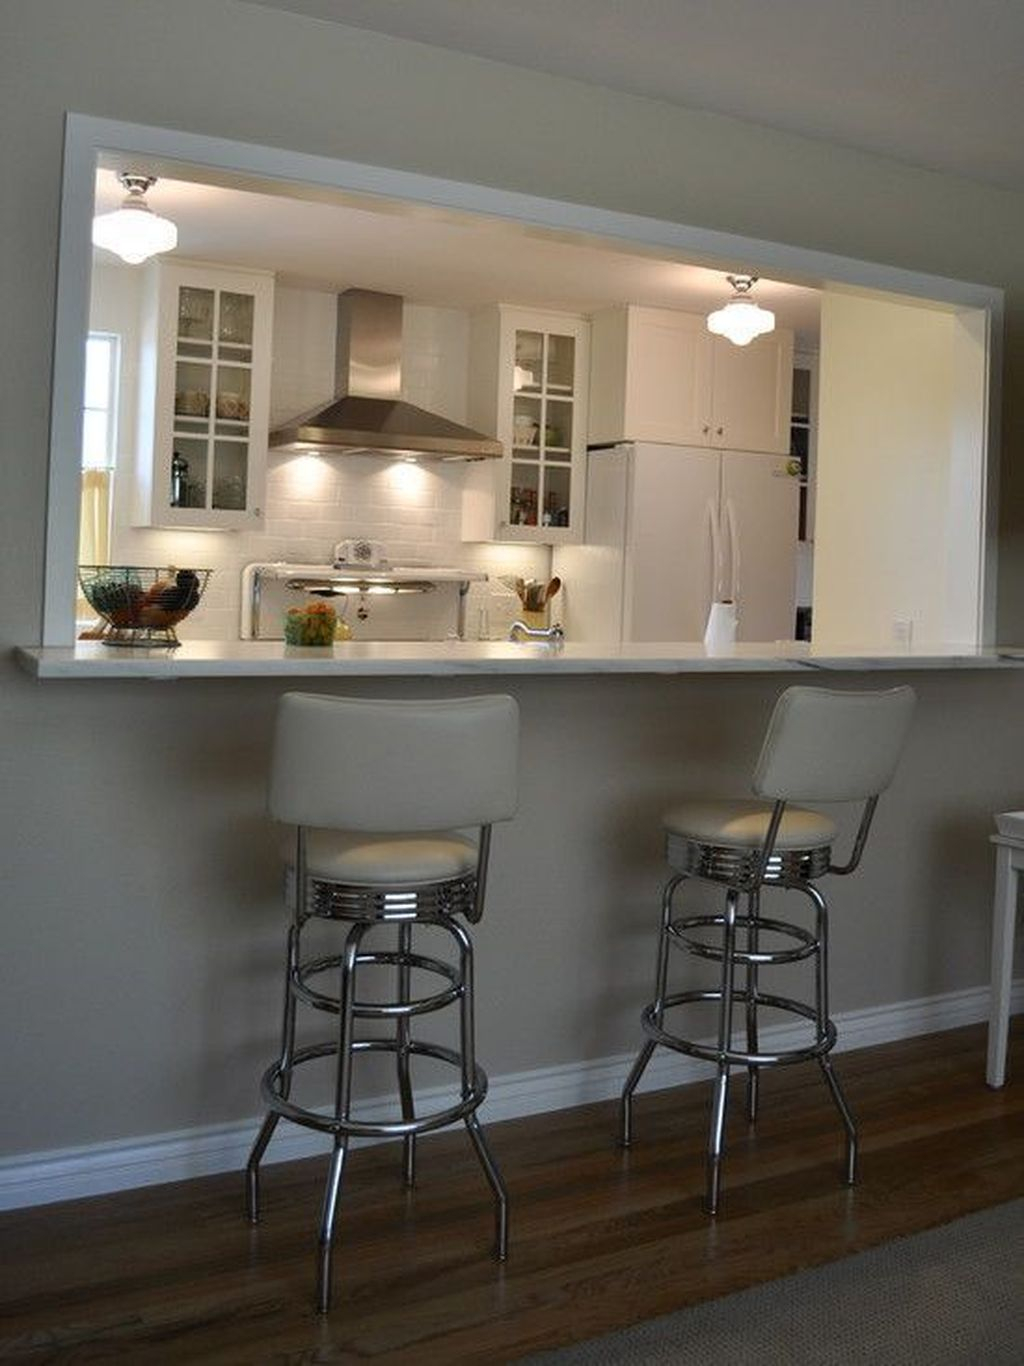 Brilliant Small Kitchen Remodel Design Ideas On A Budget 08